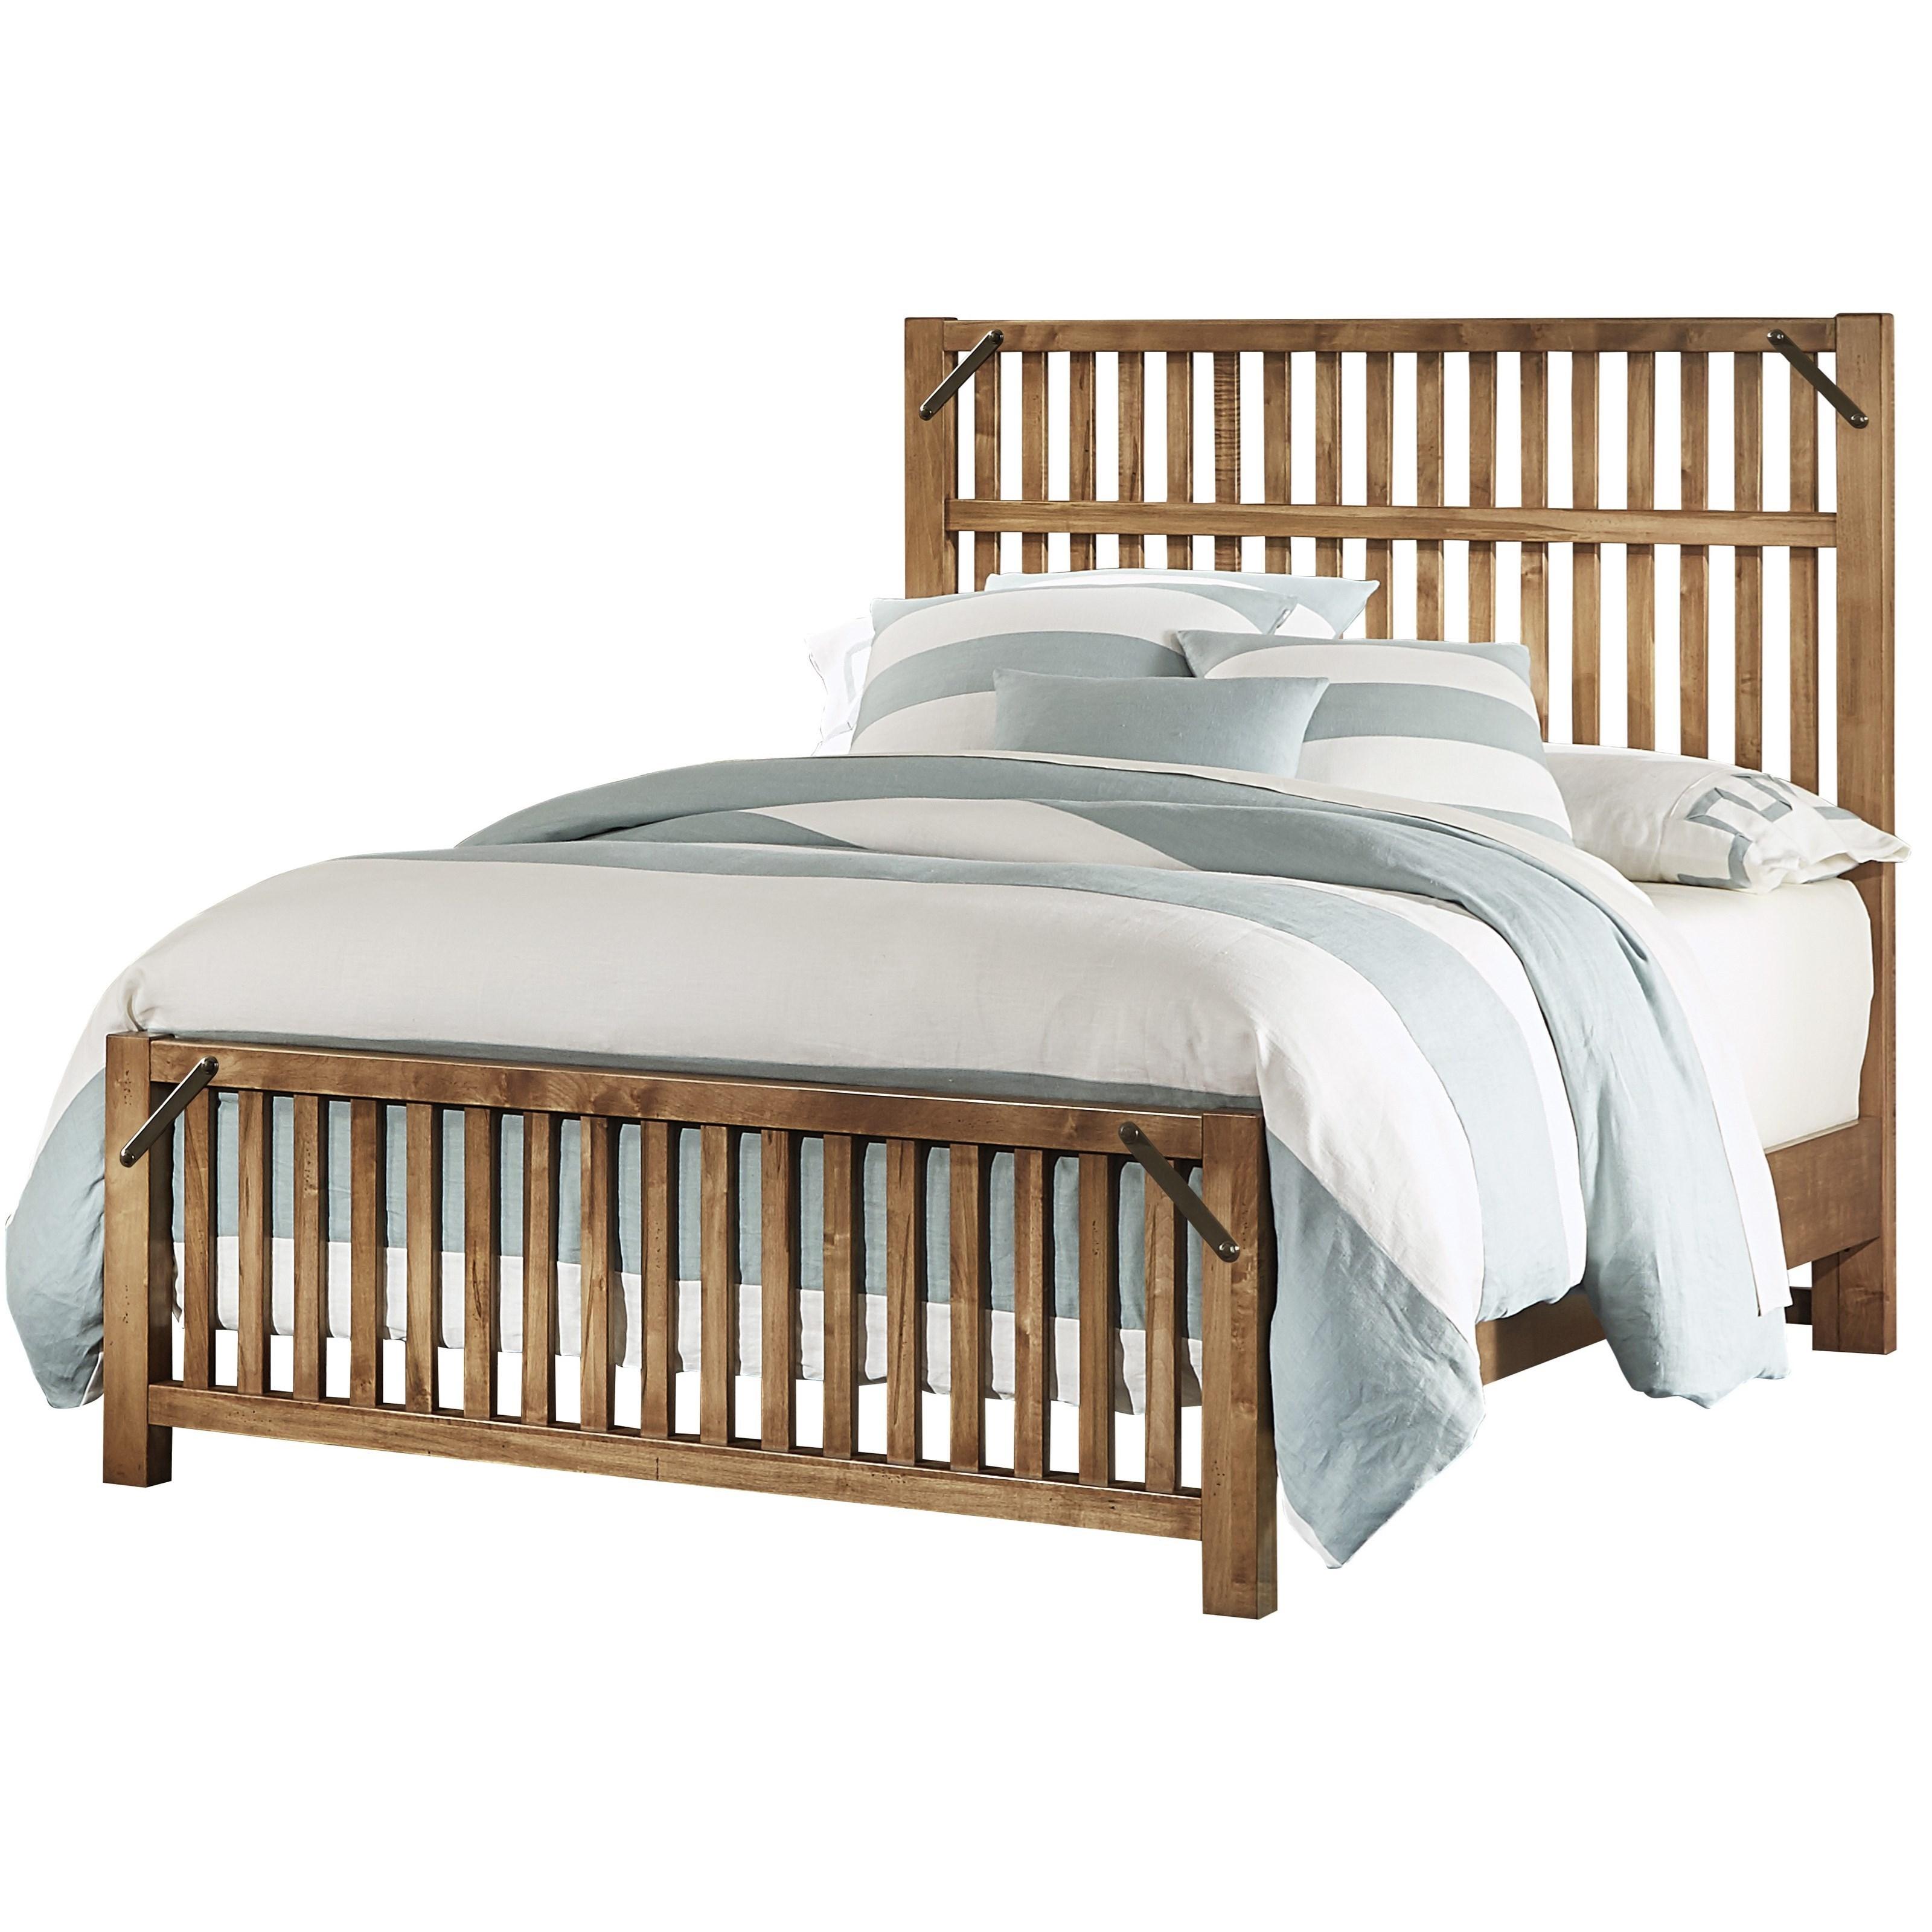 Artisan & Post Sedgwick King Bed - Item Number: 122-668+866+933+MS2